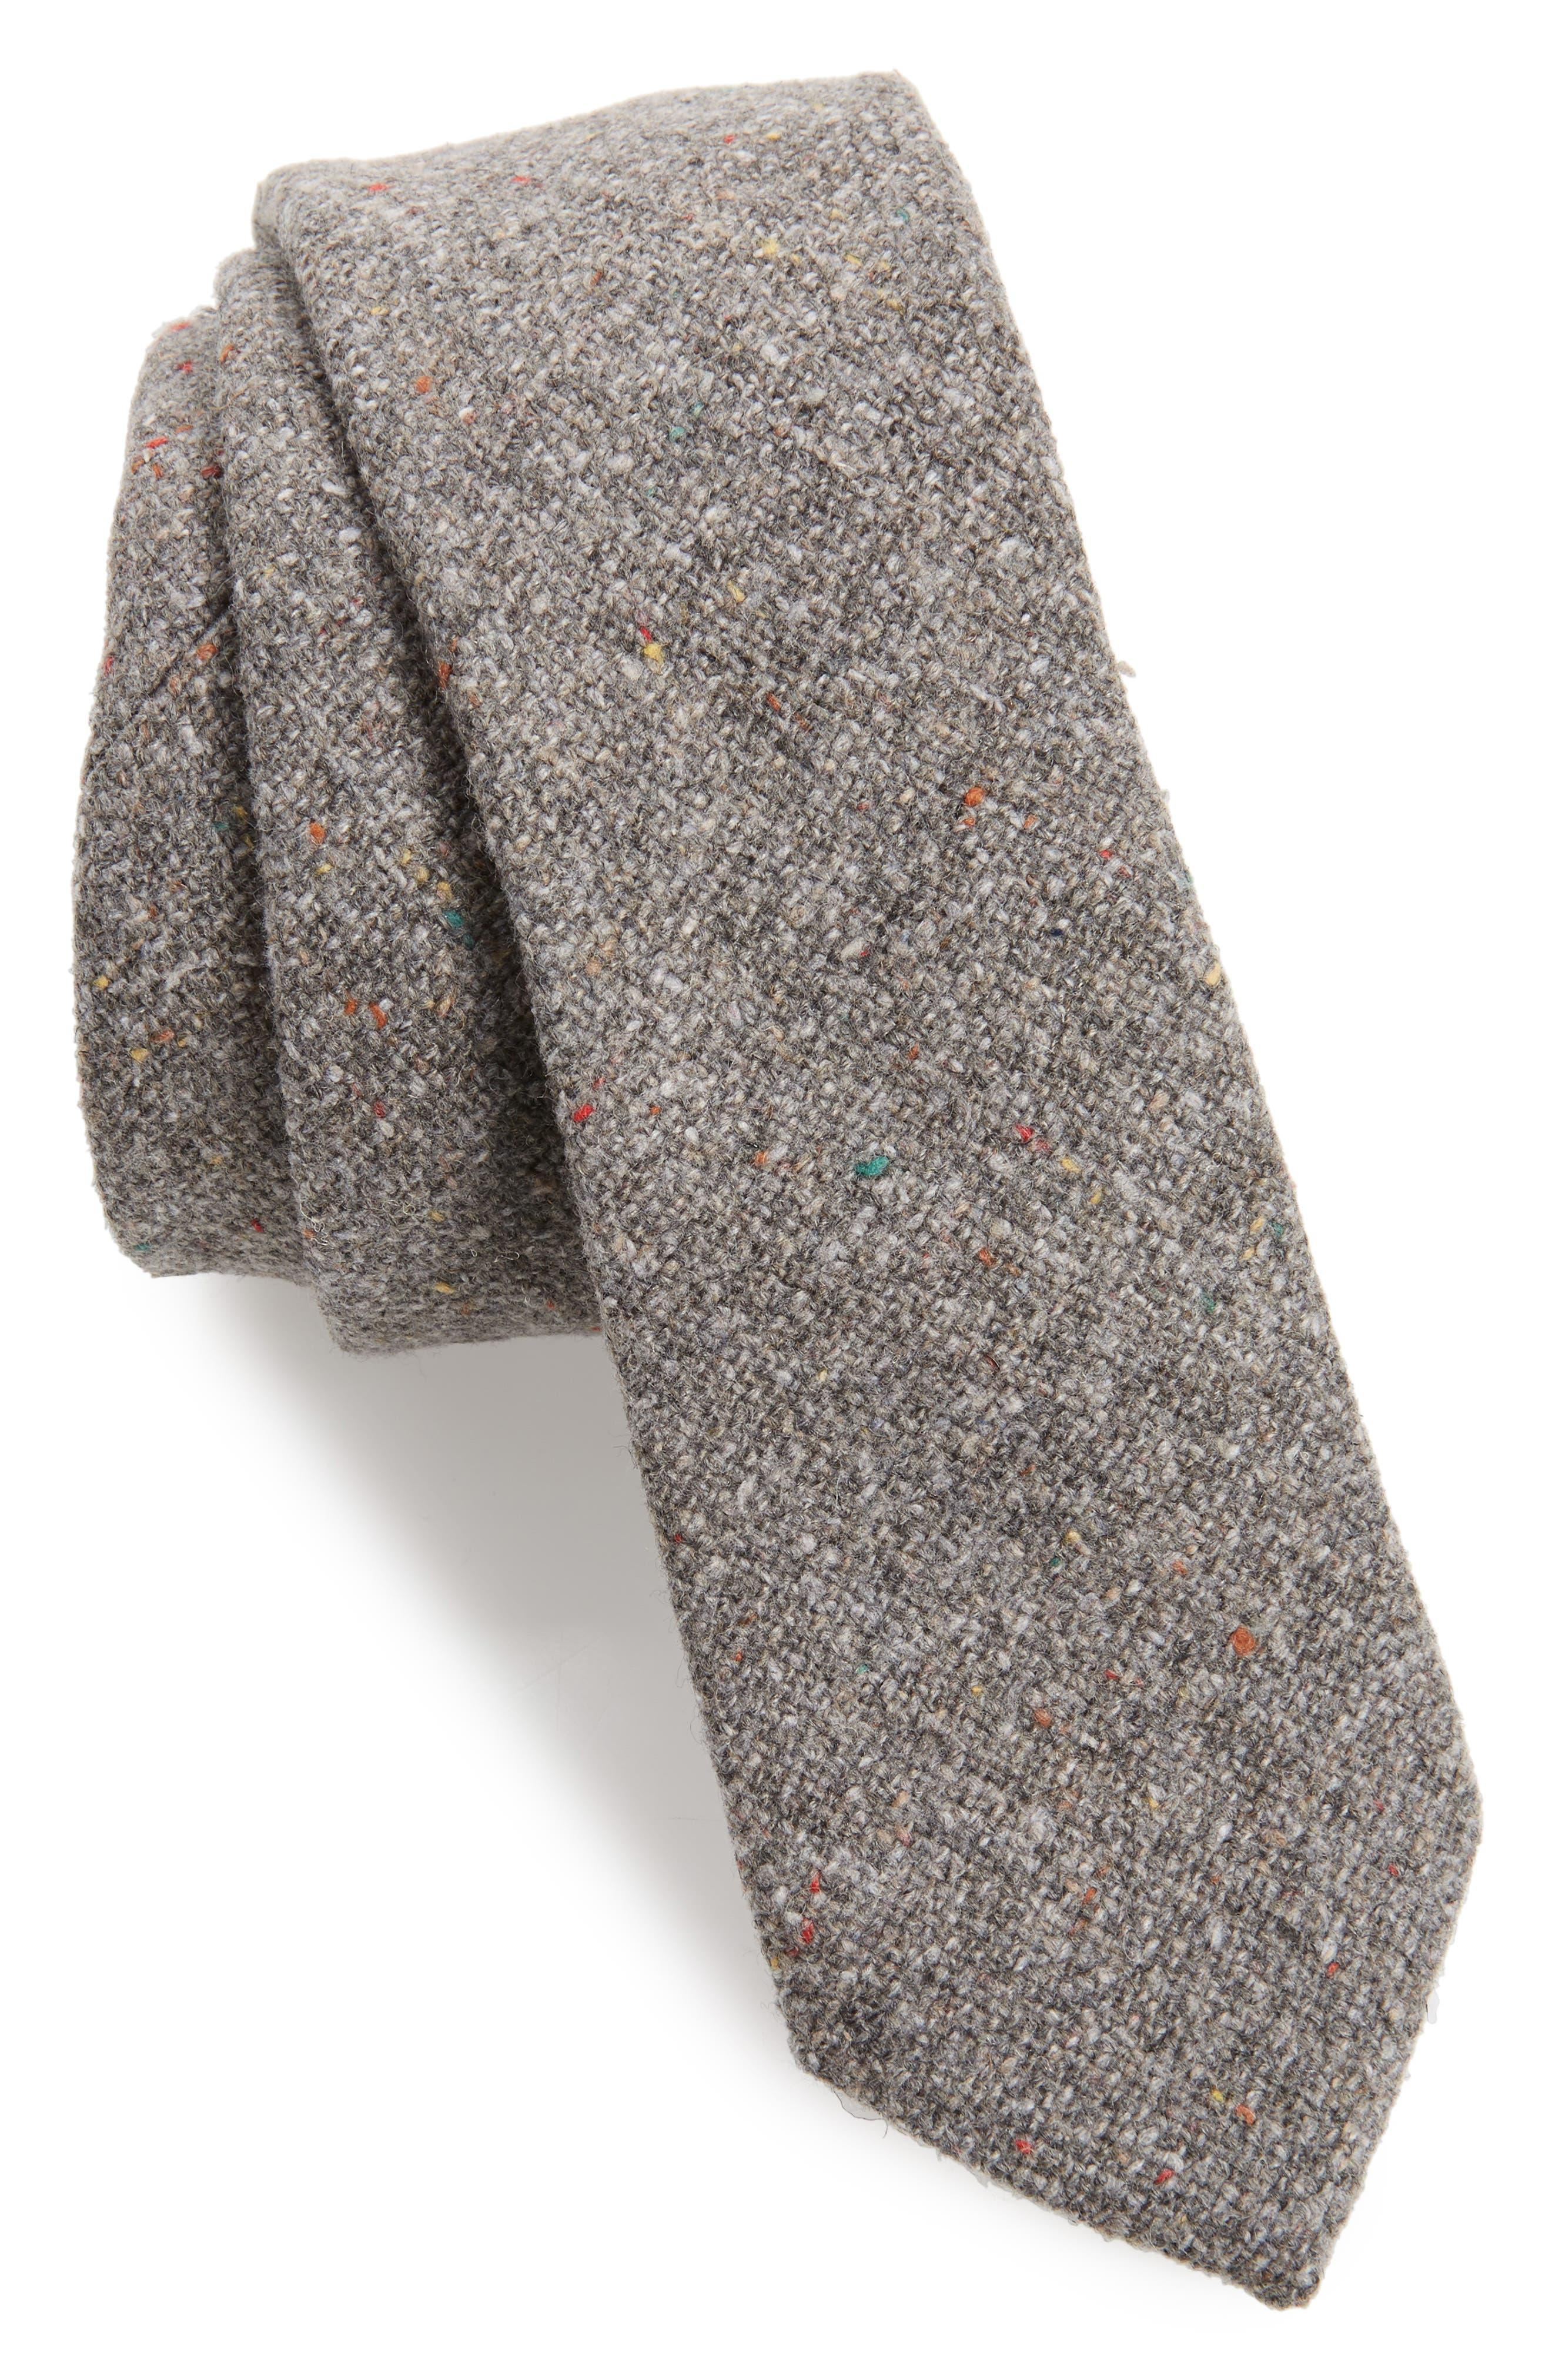 Beaufort Solid Wool Blend Tie,                         Main,                         color, 020